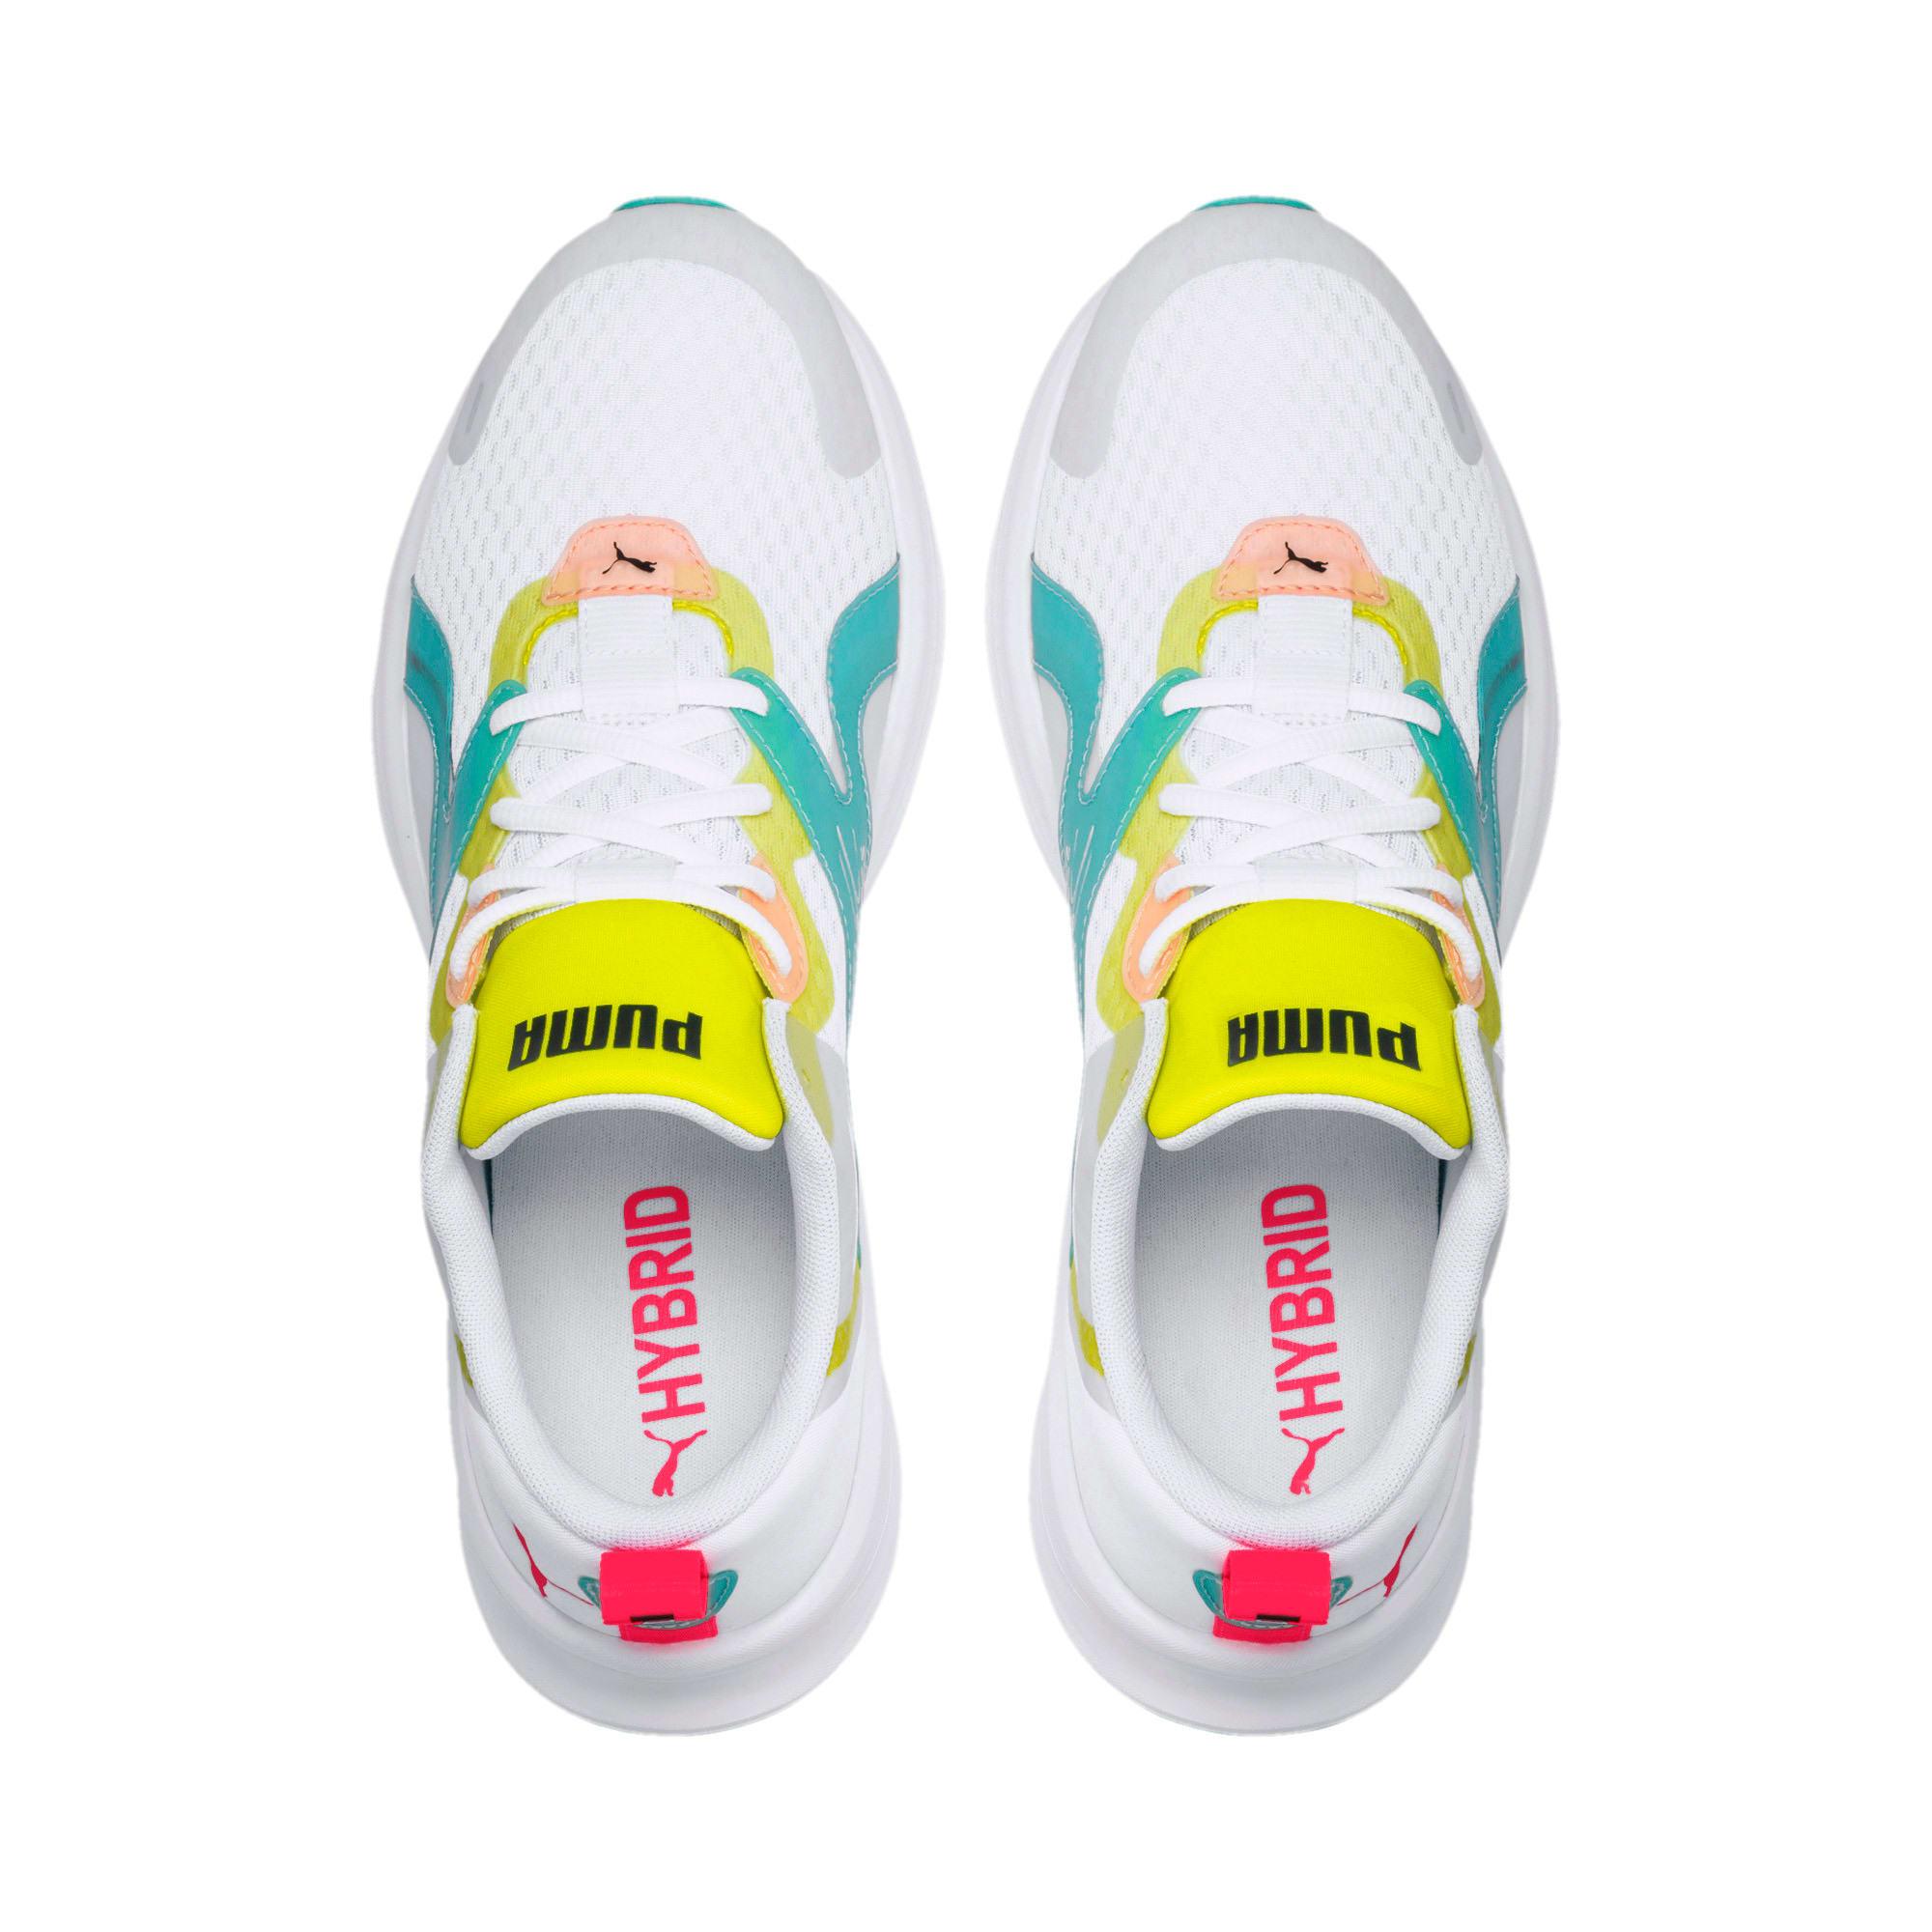 Thumbnail 6 of HYBRID Fuego Men's Running Shoes, White-Nrgy Rose-Yellow Alert, medium